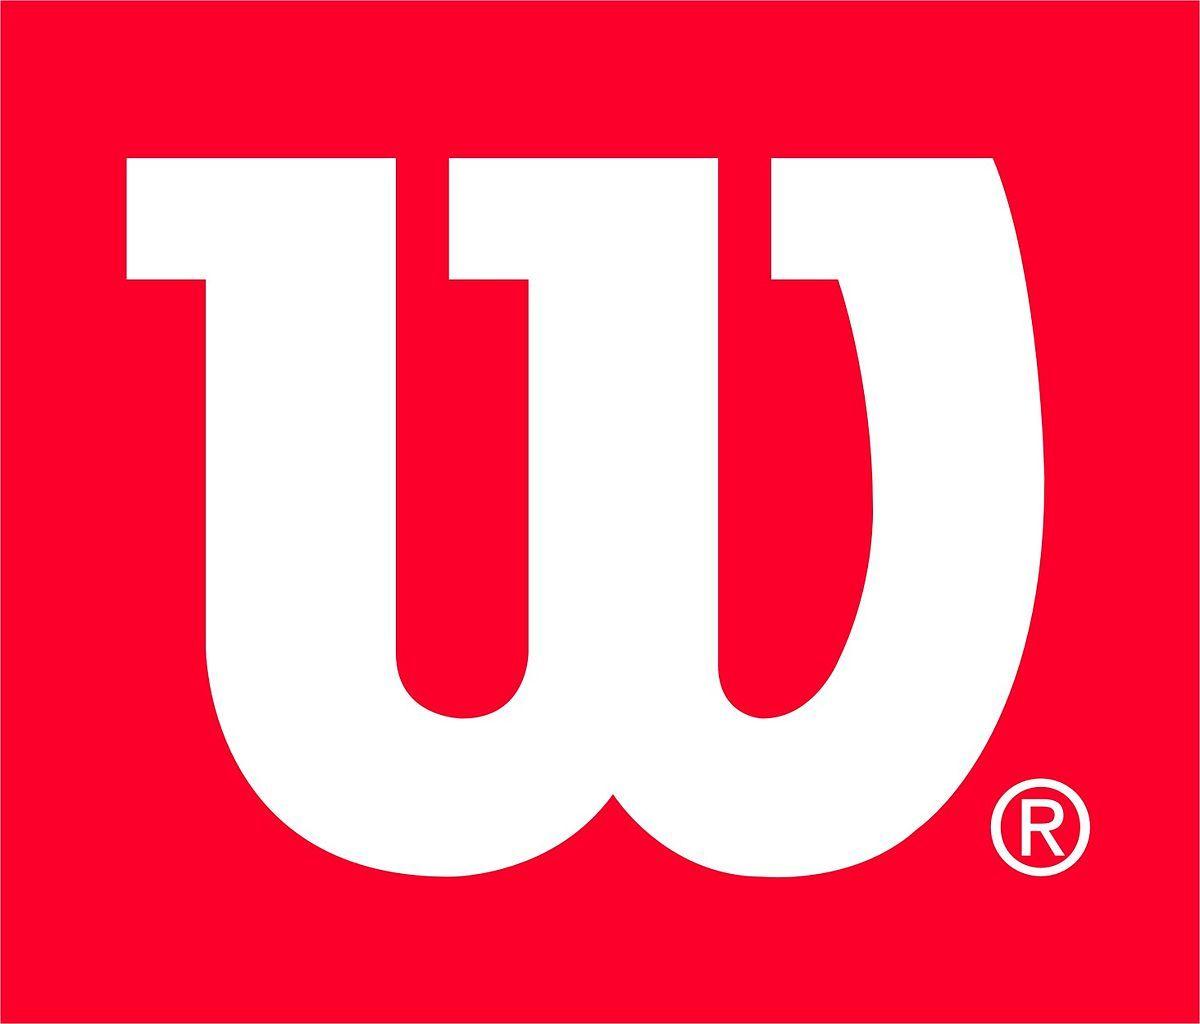 Wilson Tennis Rackets Equipment And Accessories Logos Wilson Logo W Logos